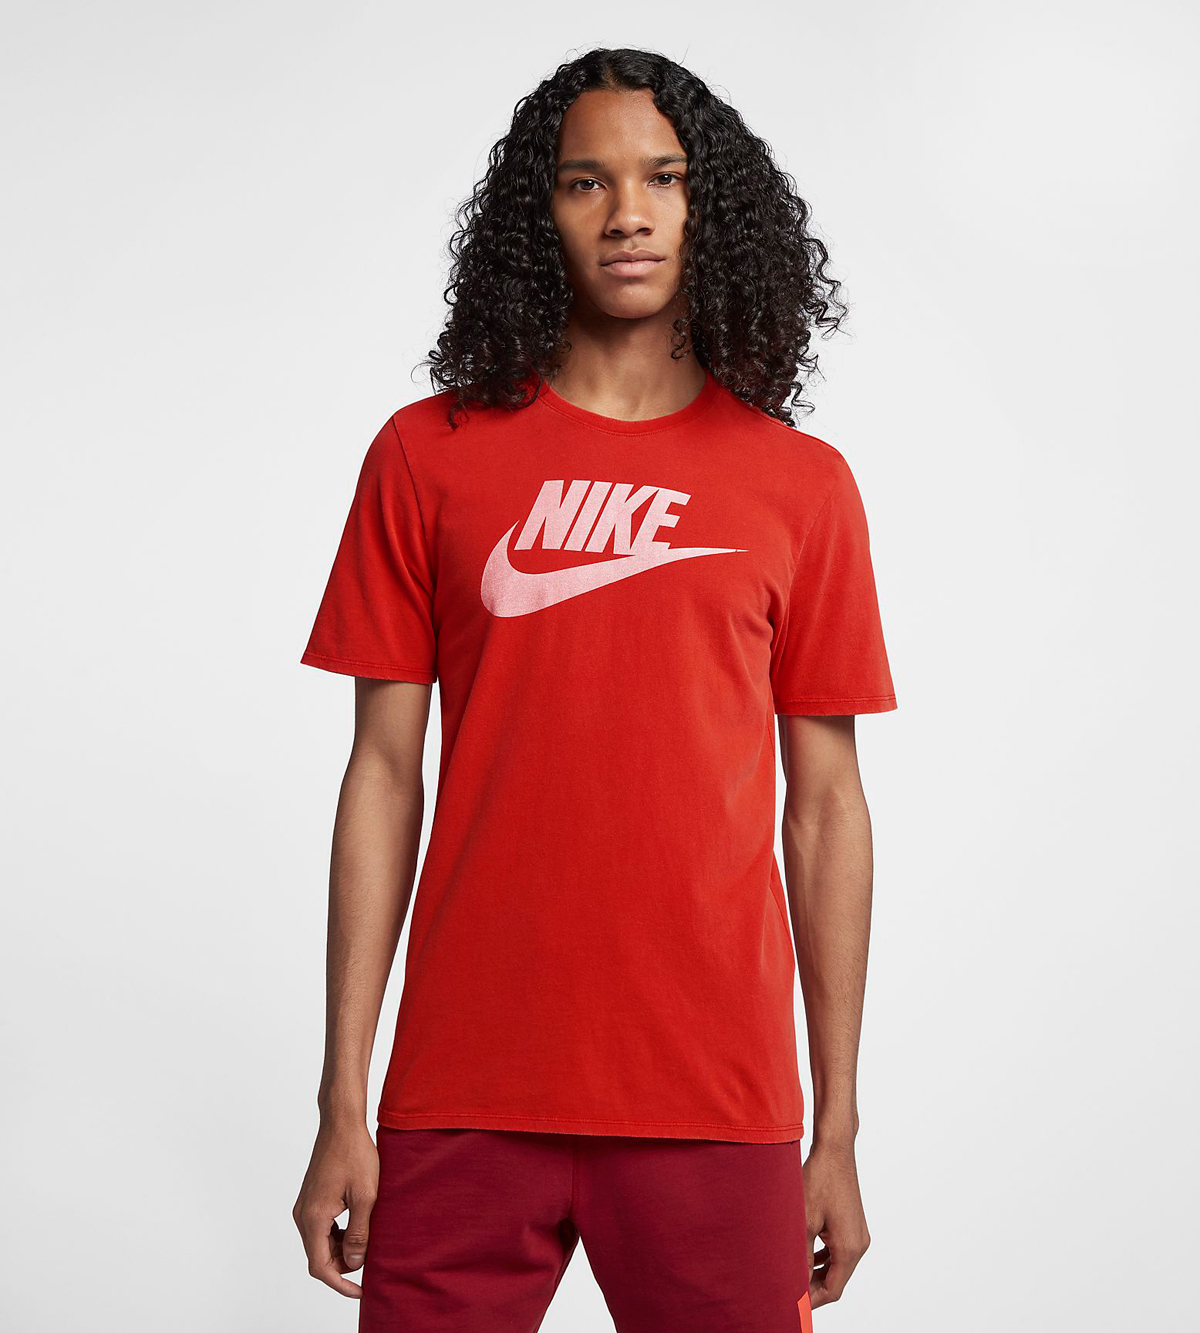 nike-sportswear-habanero-red-shirt